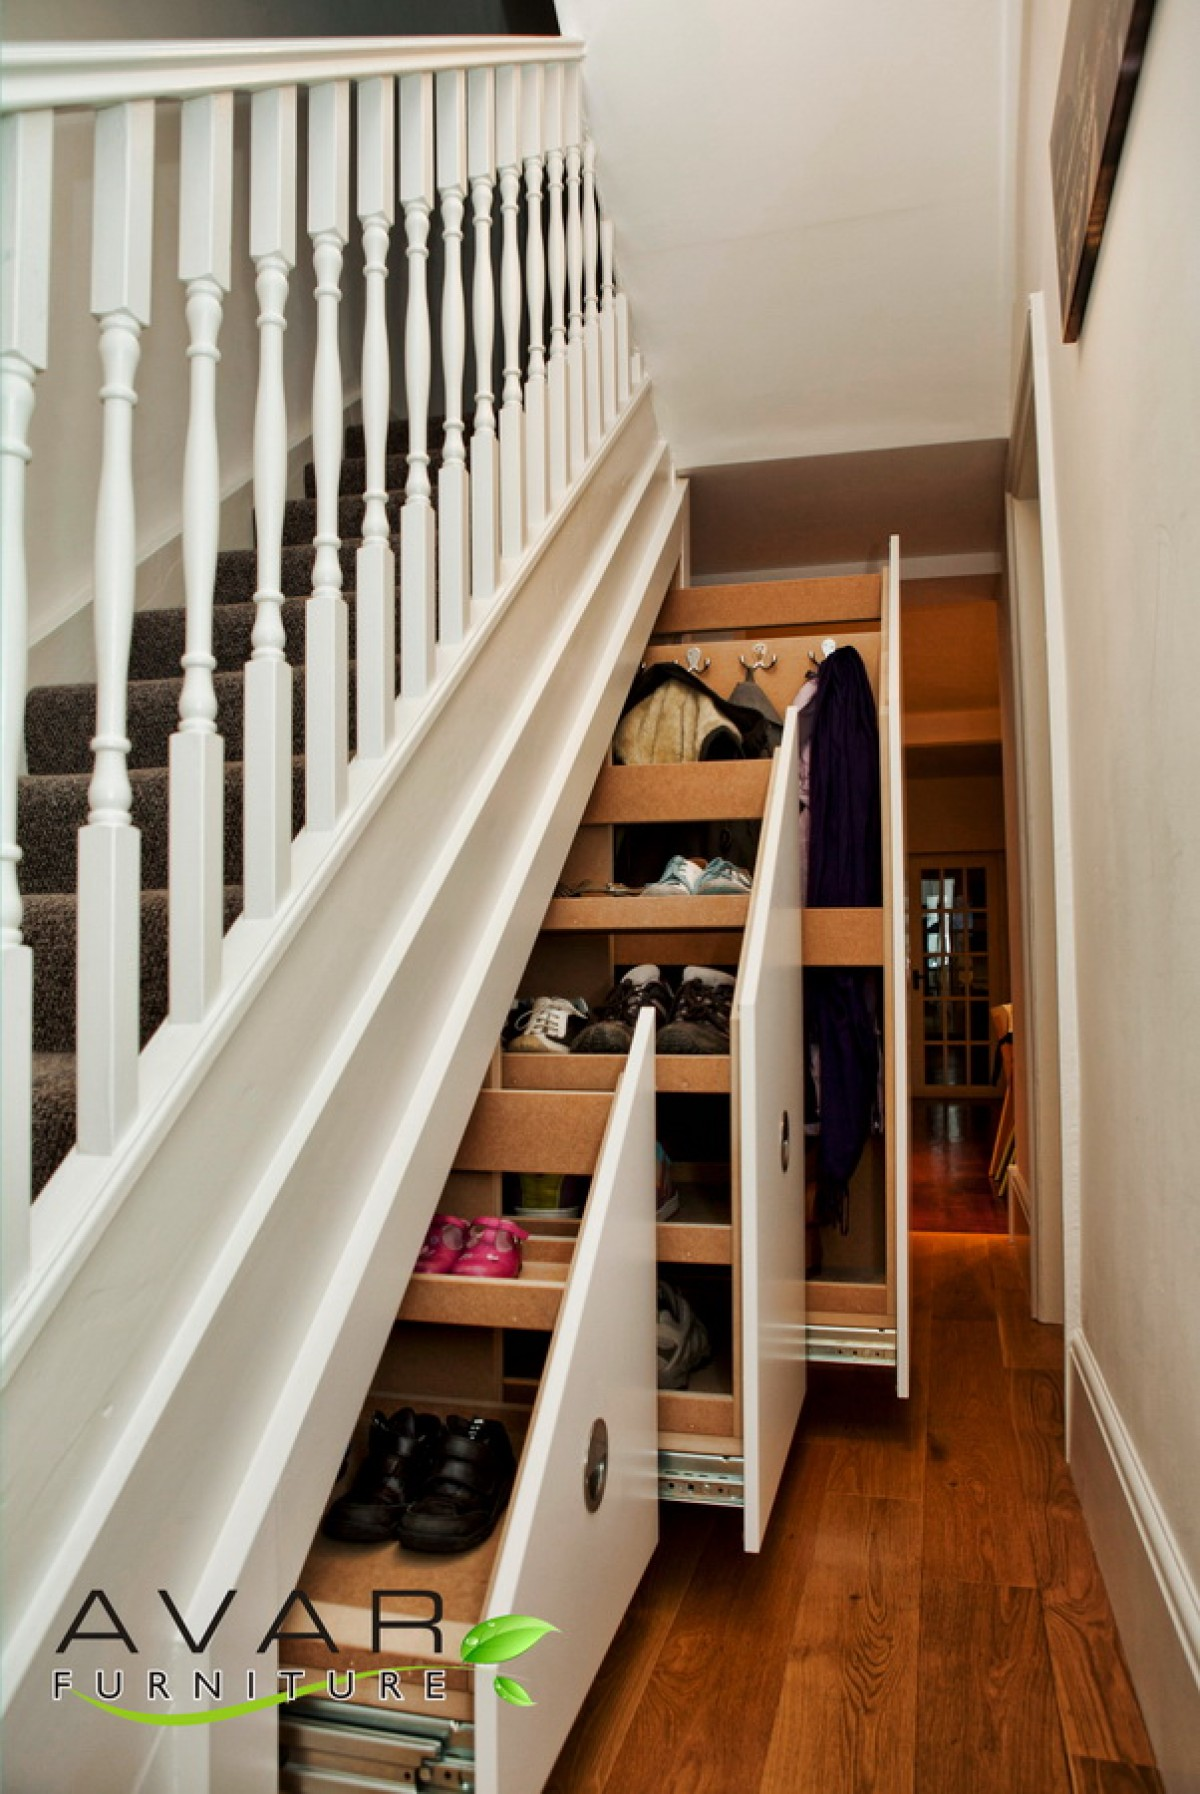 Under The Stairs Storage Ideas Home Design Inside